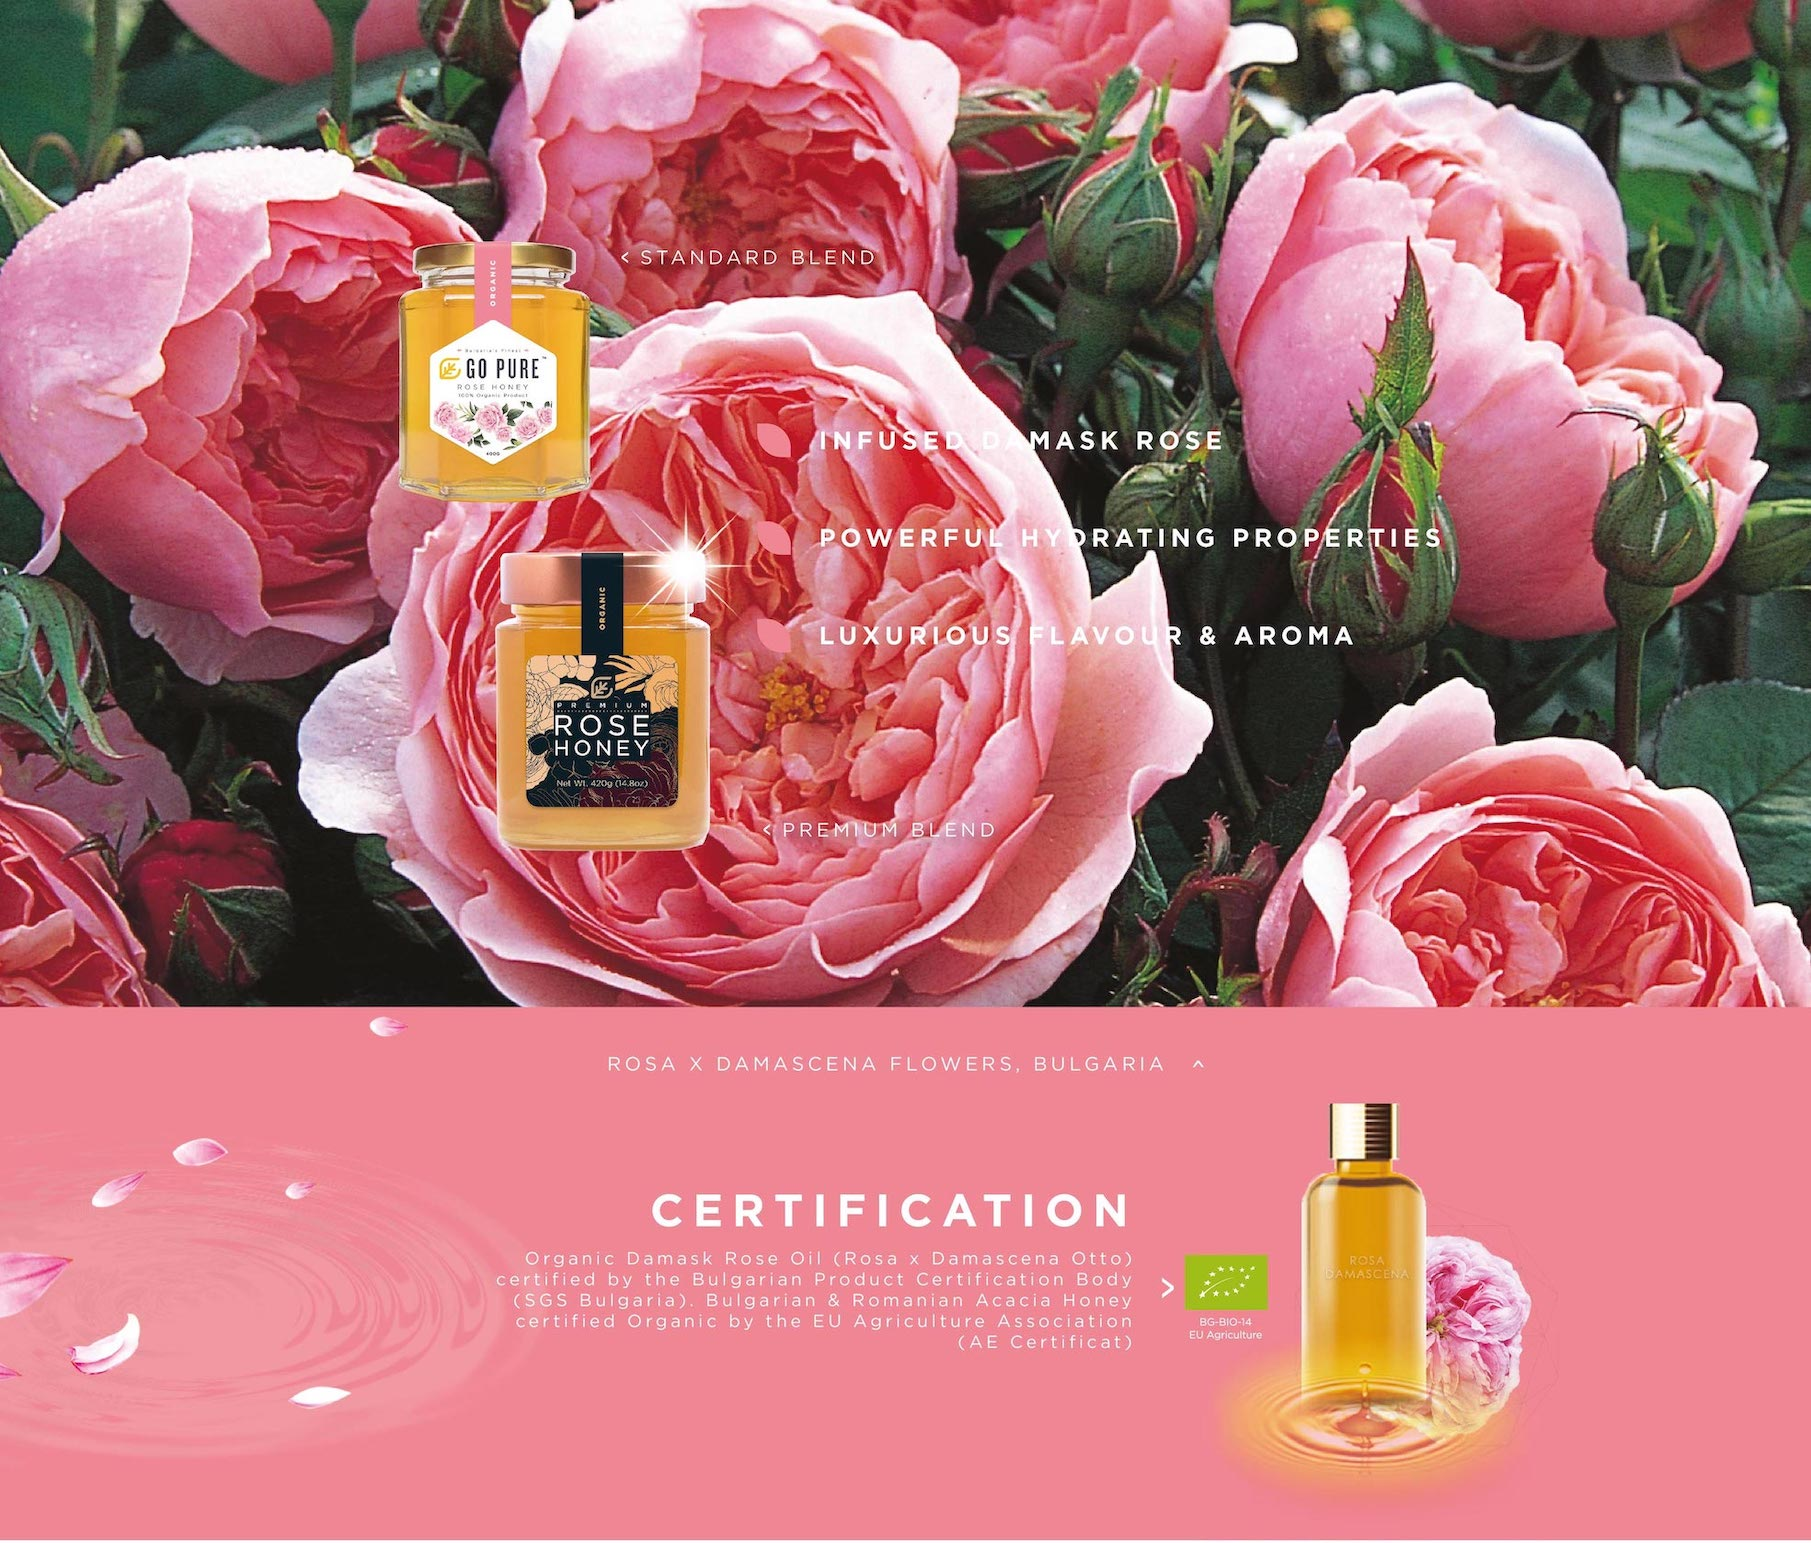 Source of Rose Honey